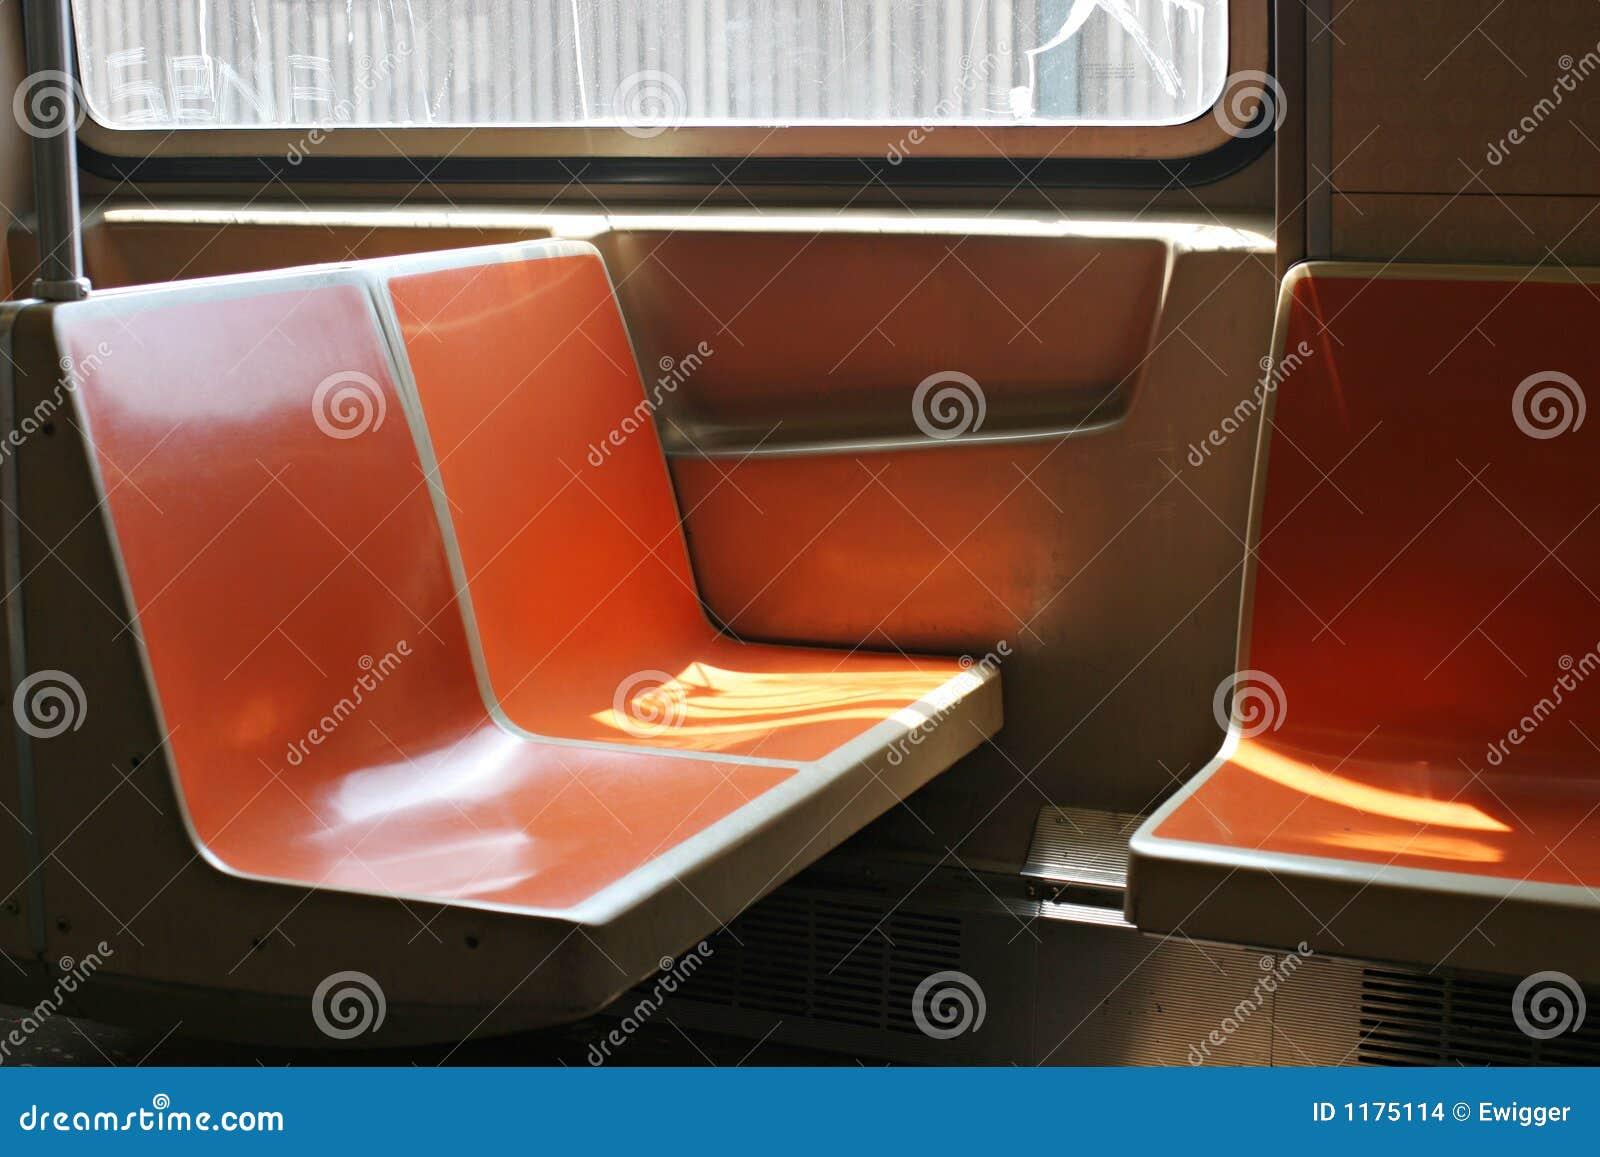 subway seats stock images image 1175114. Black Bedroom Furniture Sets. Home Design Ideas